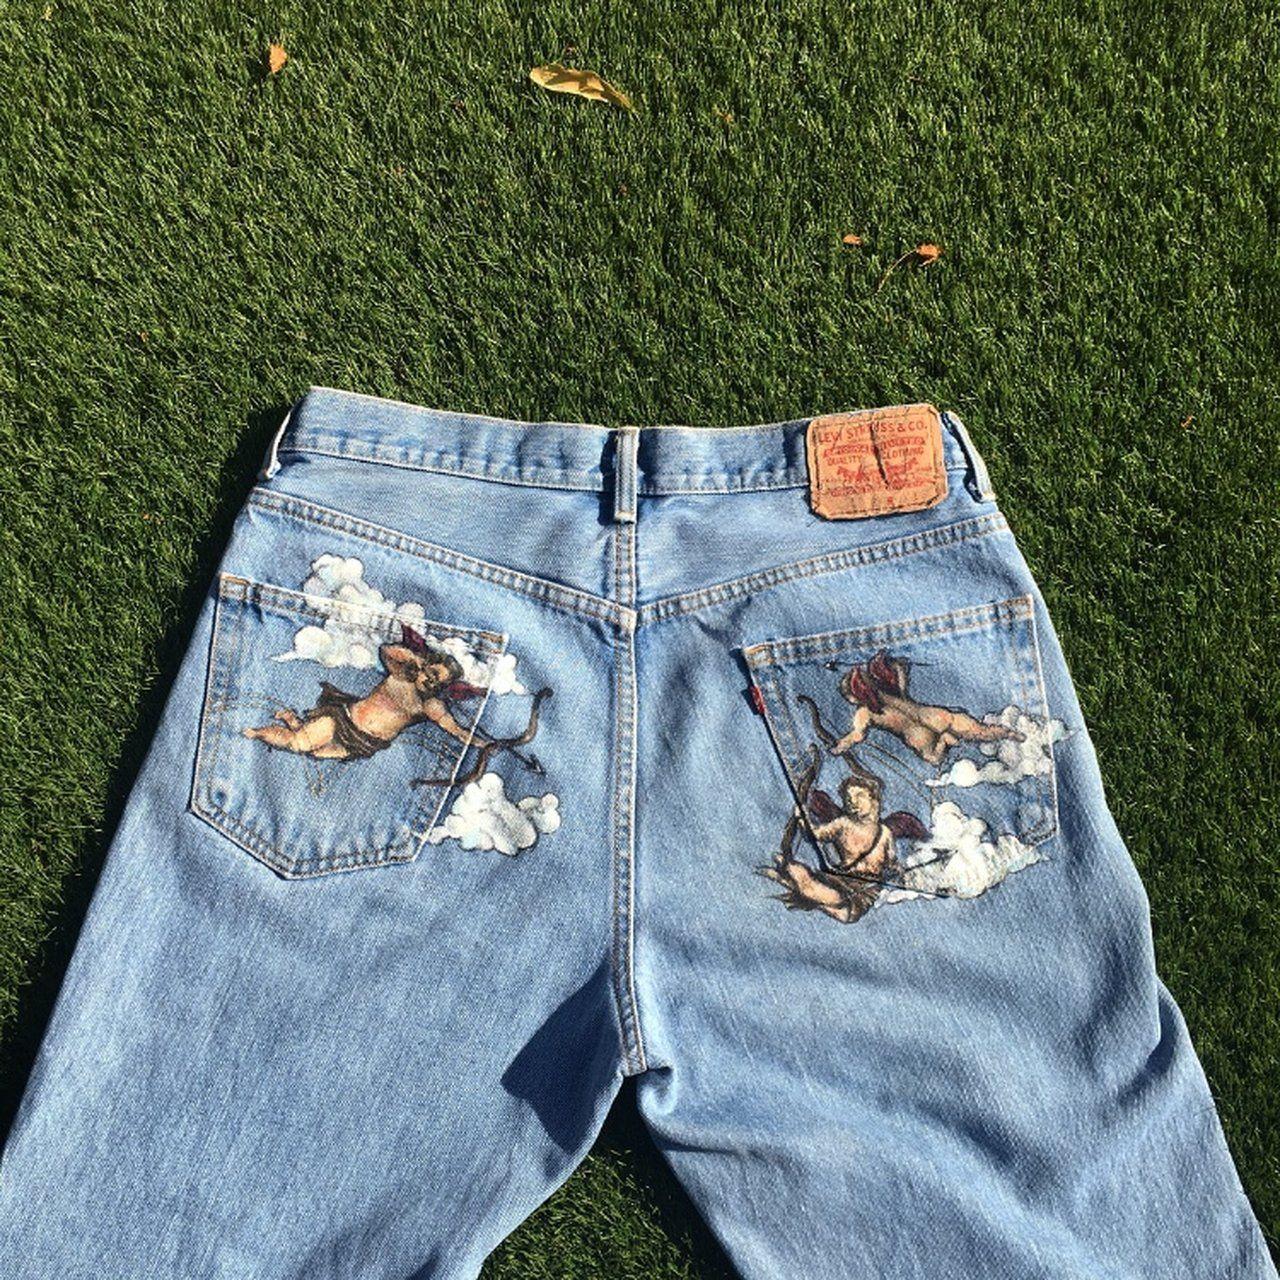 0fcdba697e 'CUPID BOOTY' Vintage LEVIS light wash blue denim jeans. fit - Depop. '